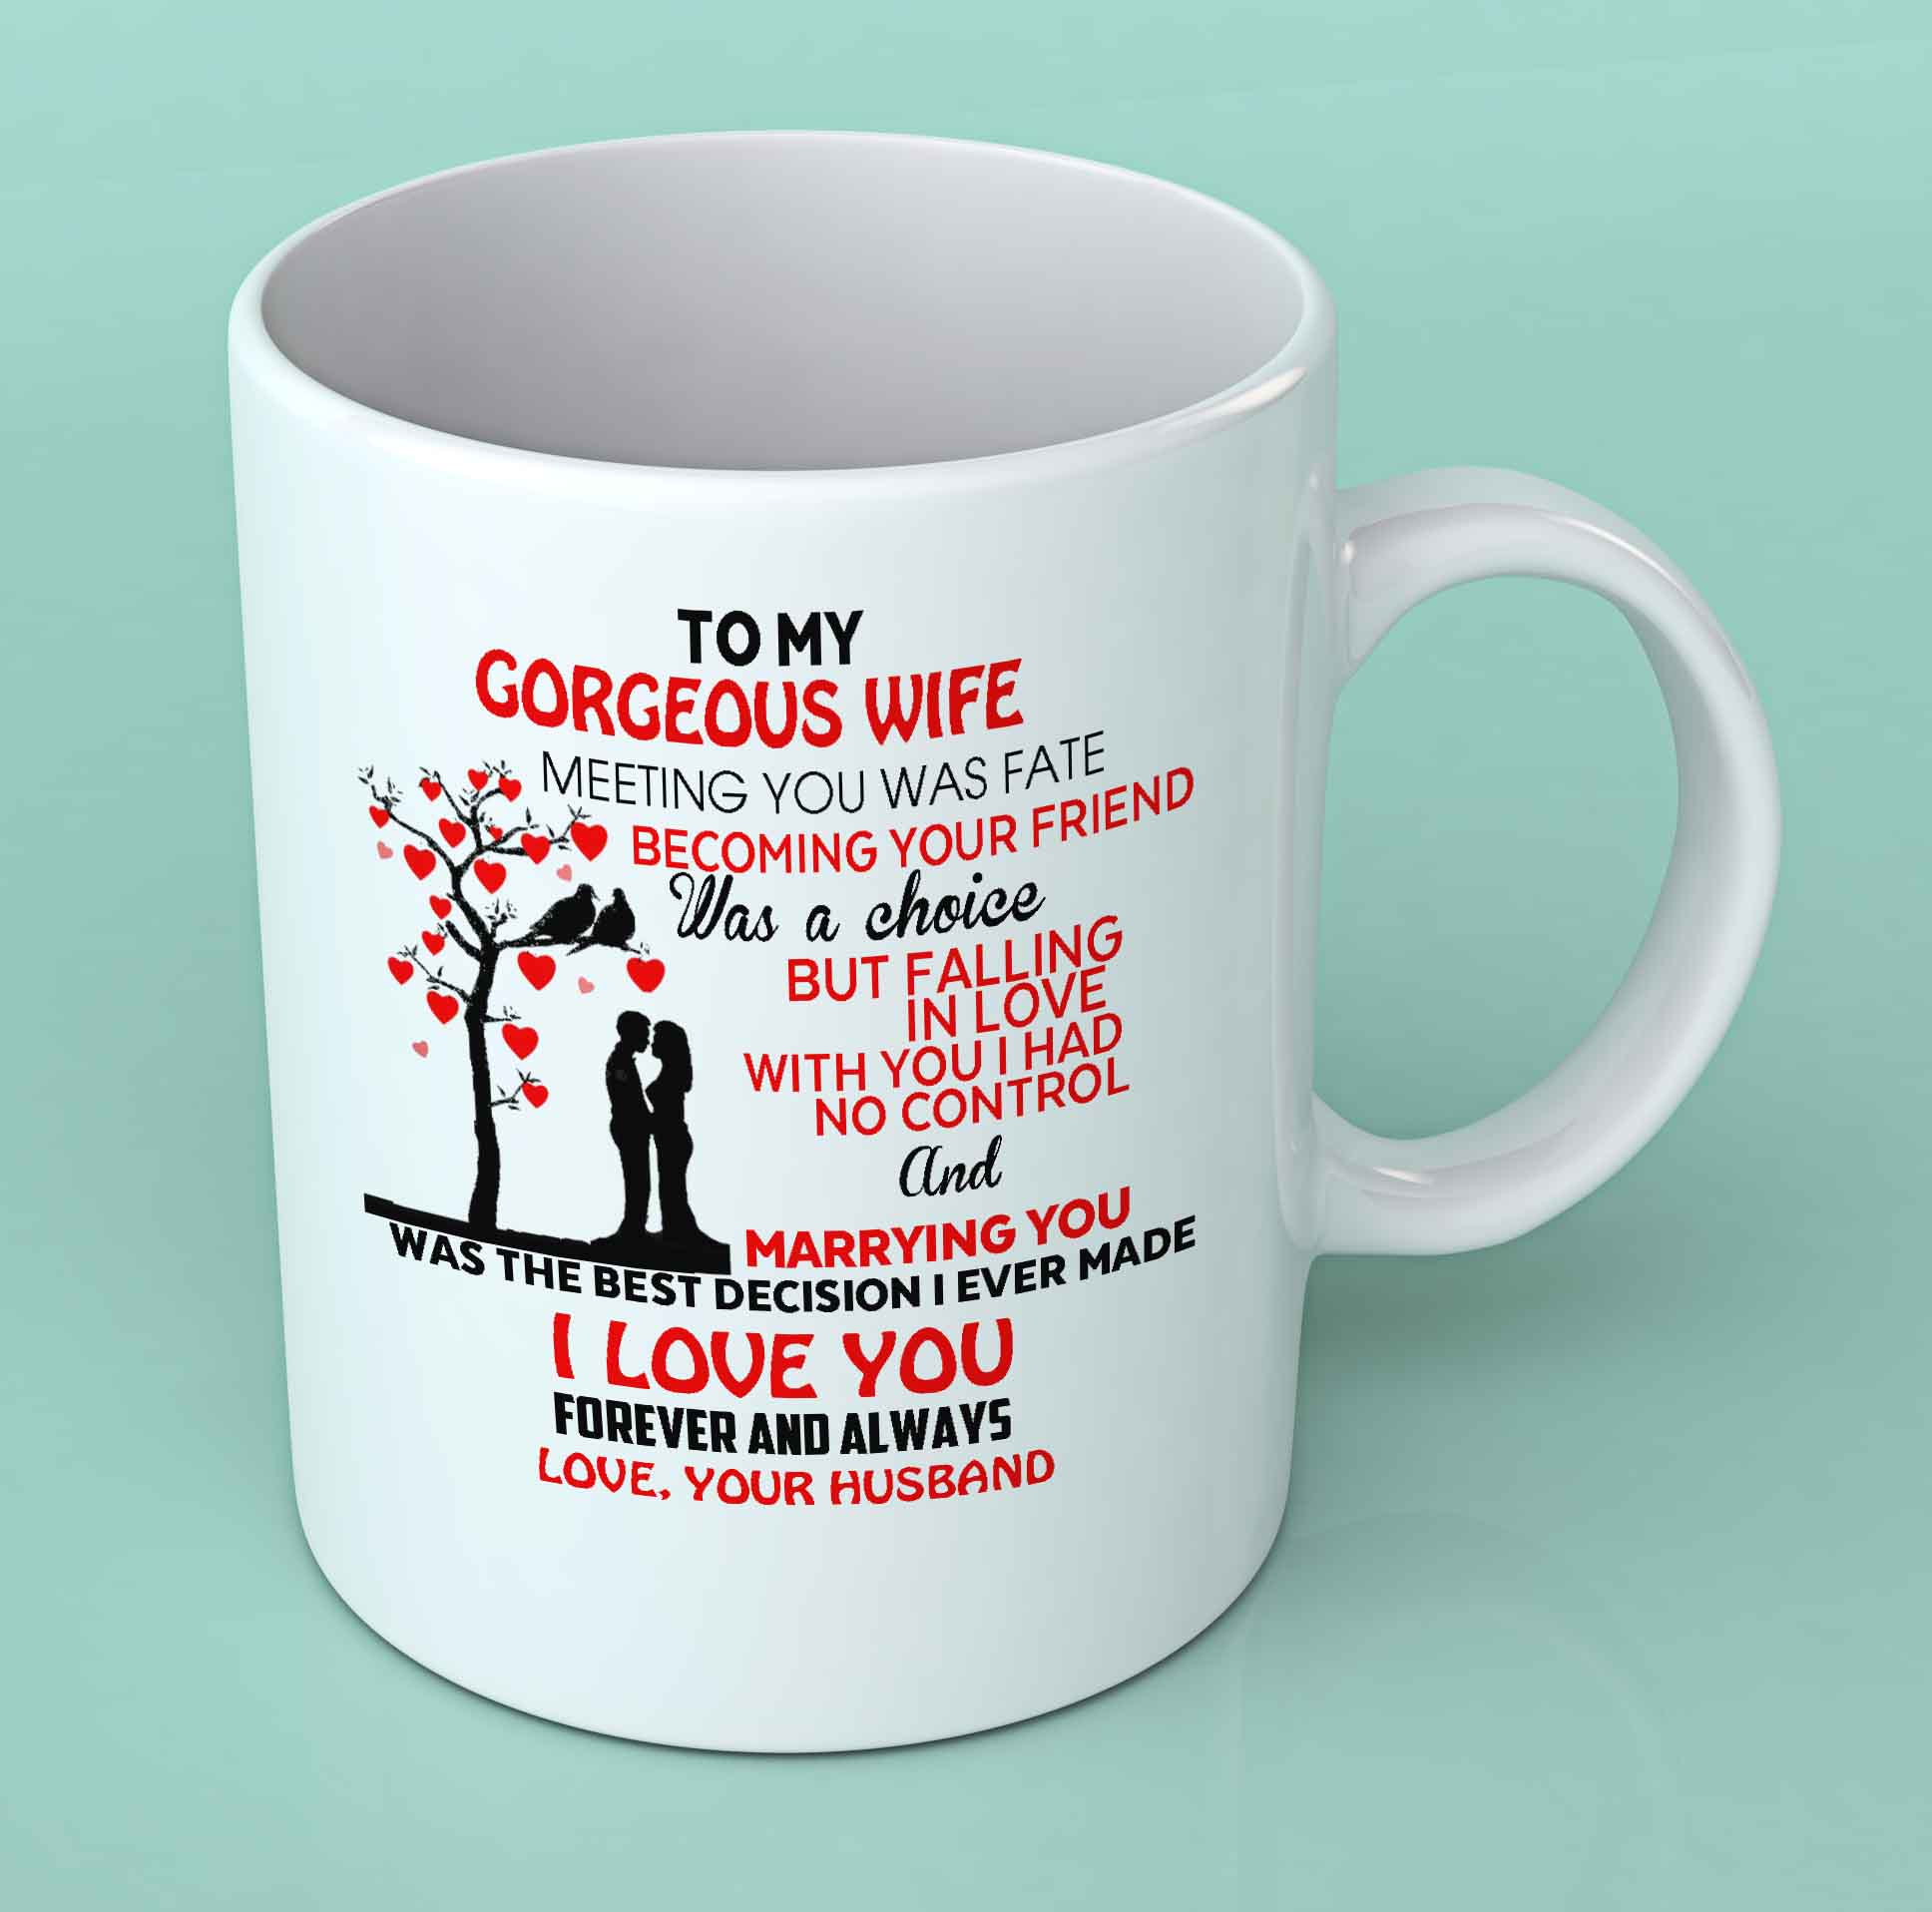 68ae2549a61 To my gorgeous wife coffee mug - Mugman